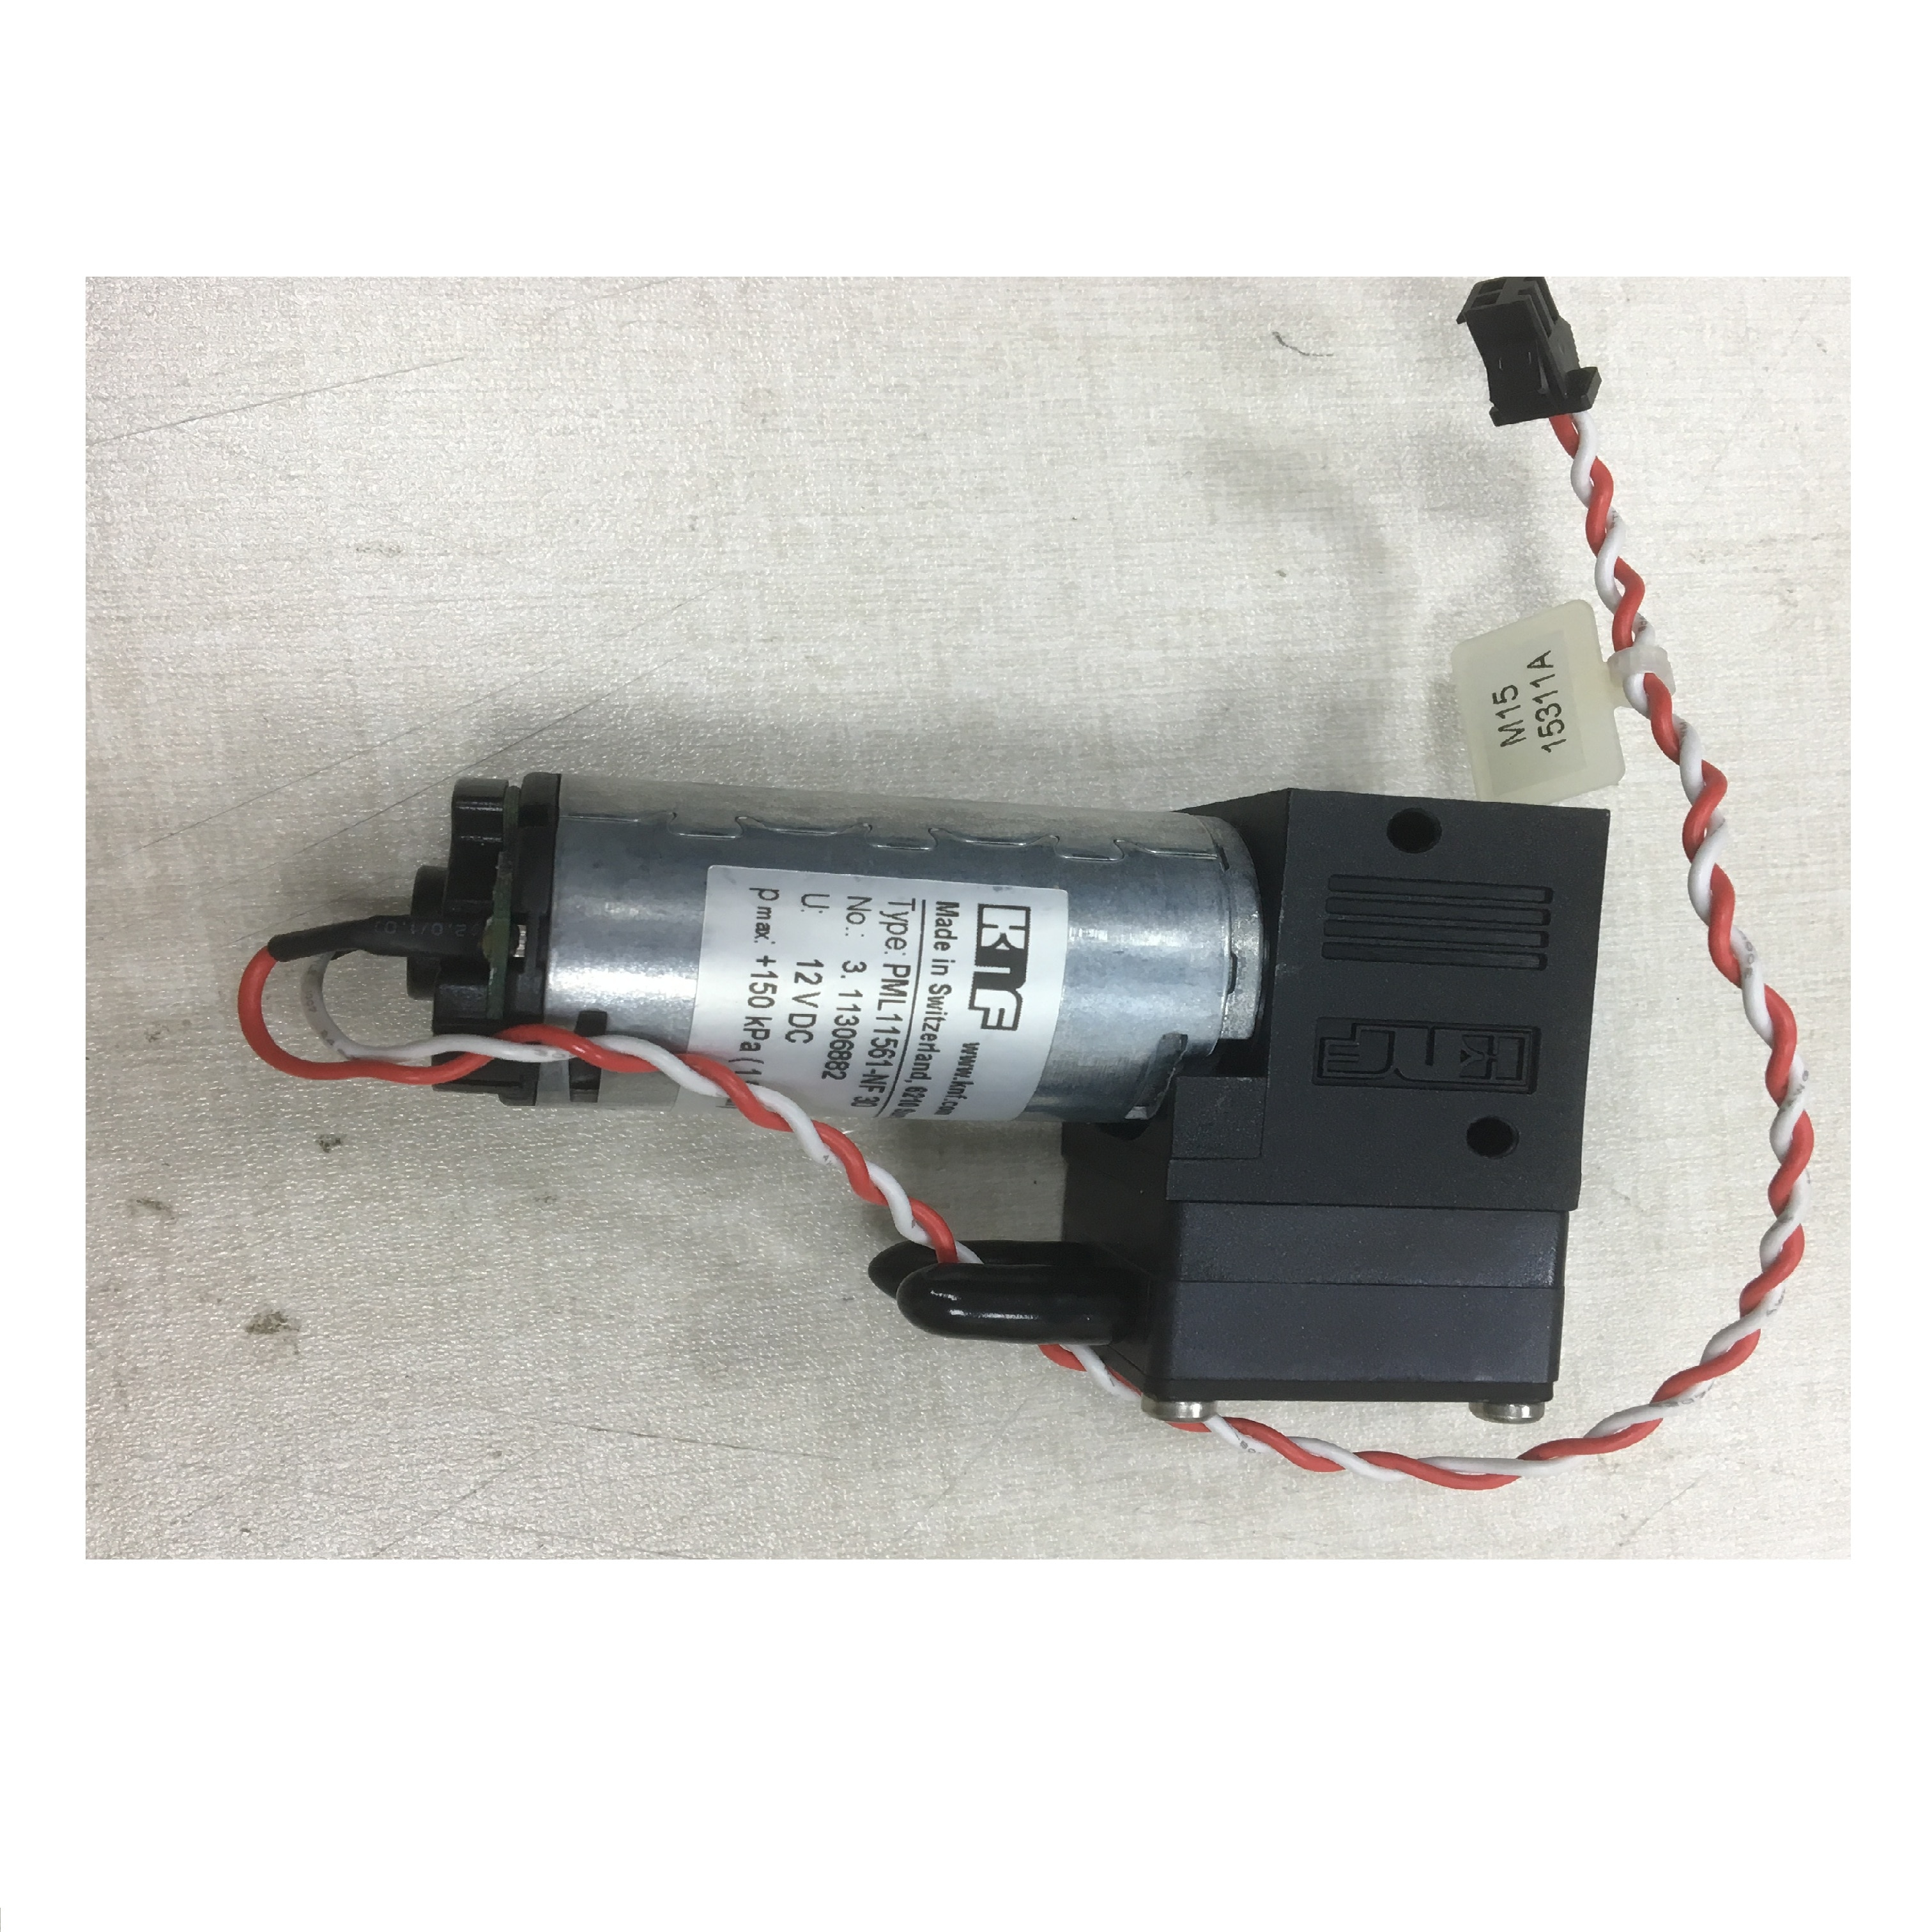 Mindray BC2300/BC2800/BC-1800/2900/BC3000PLUS гематологический анализатор насос для отходов/насос отрицательного давления